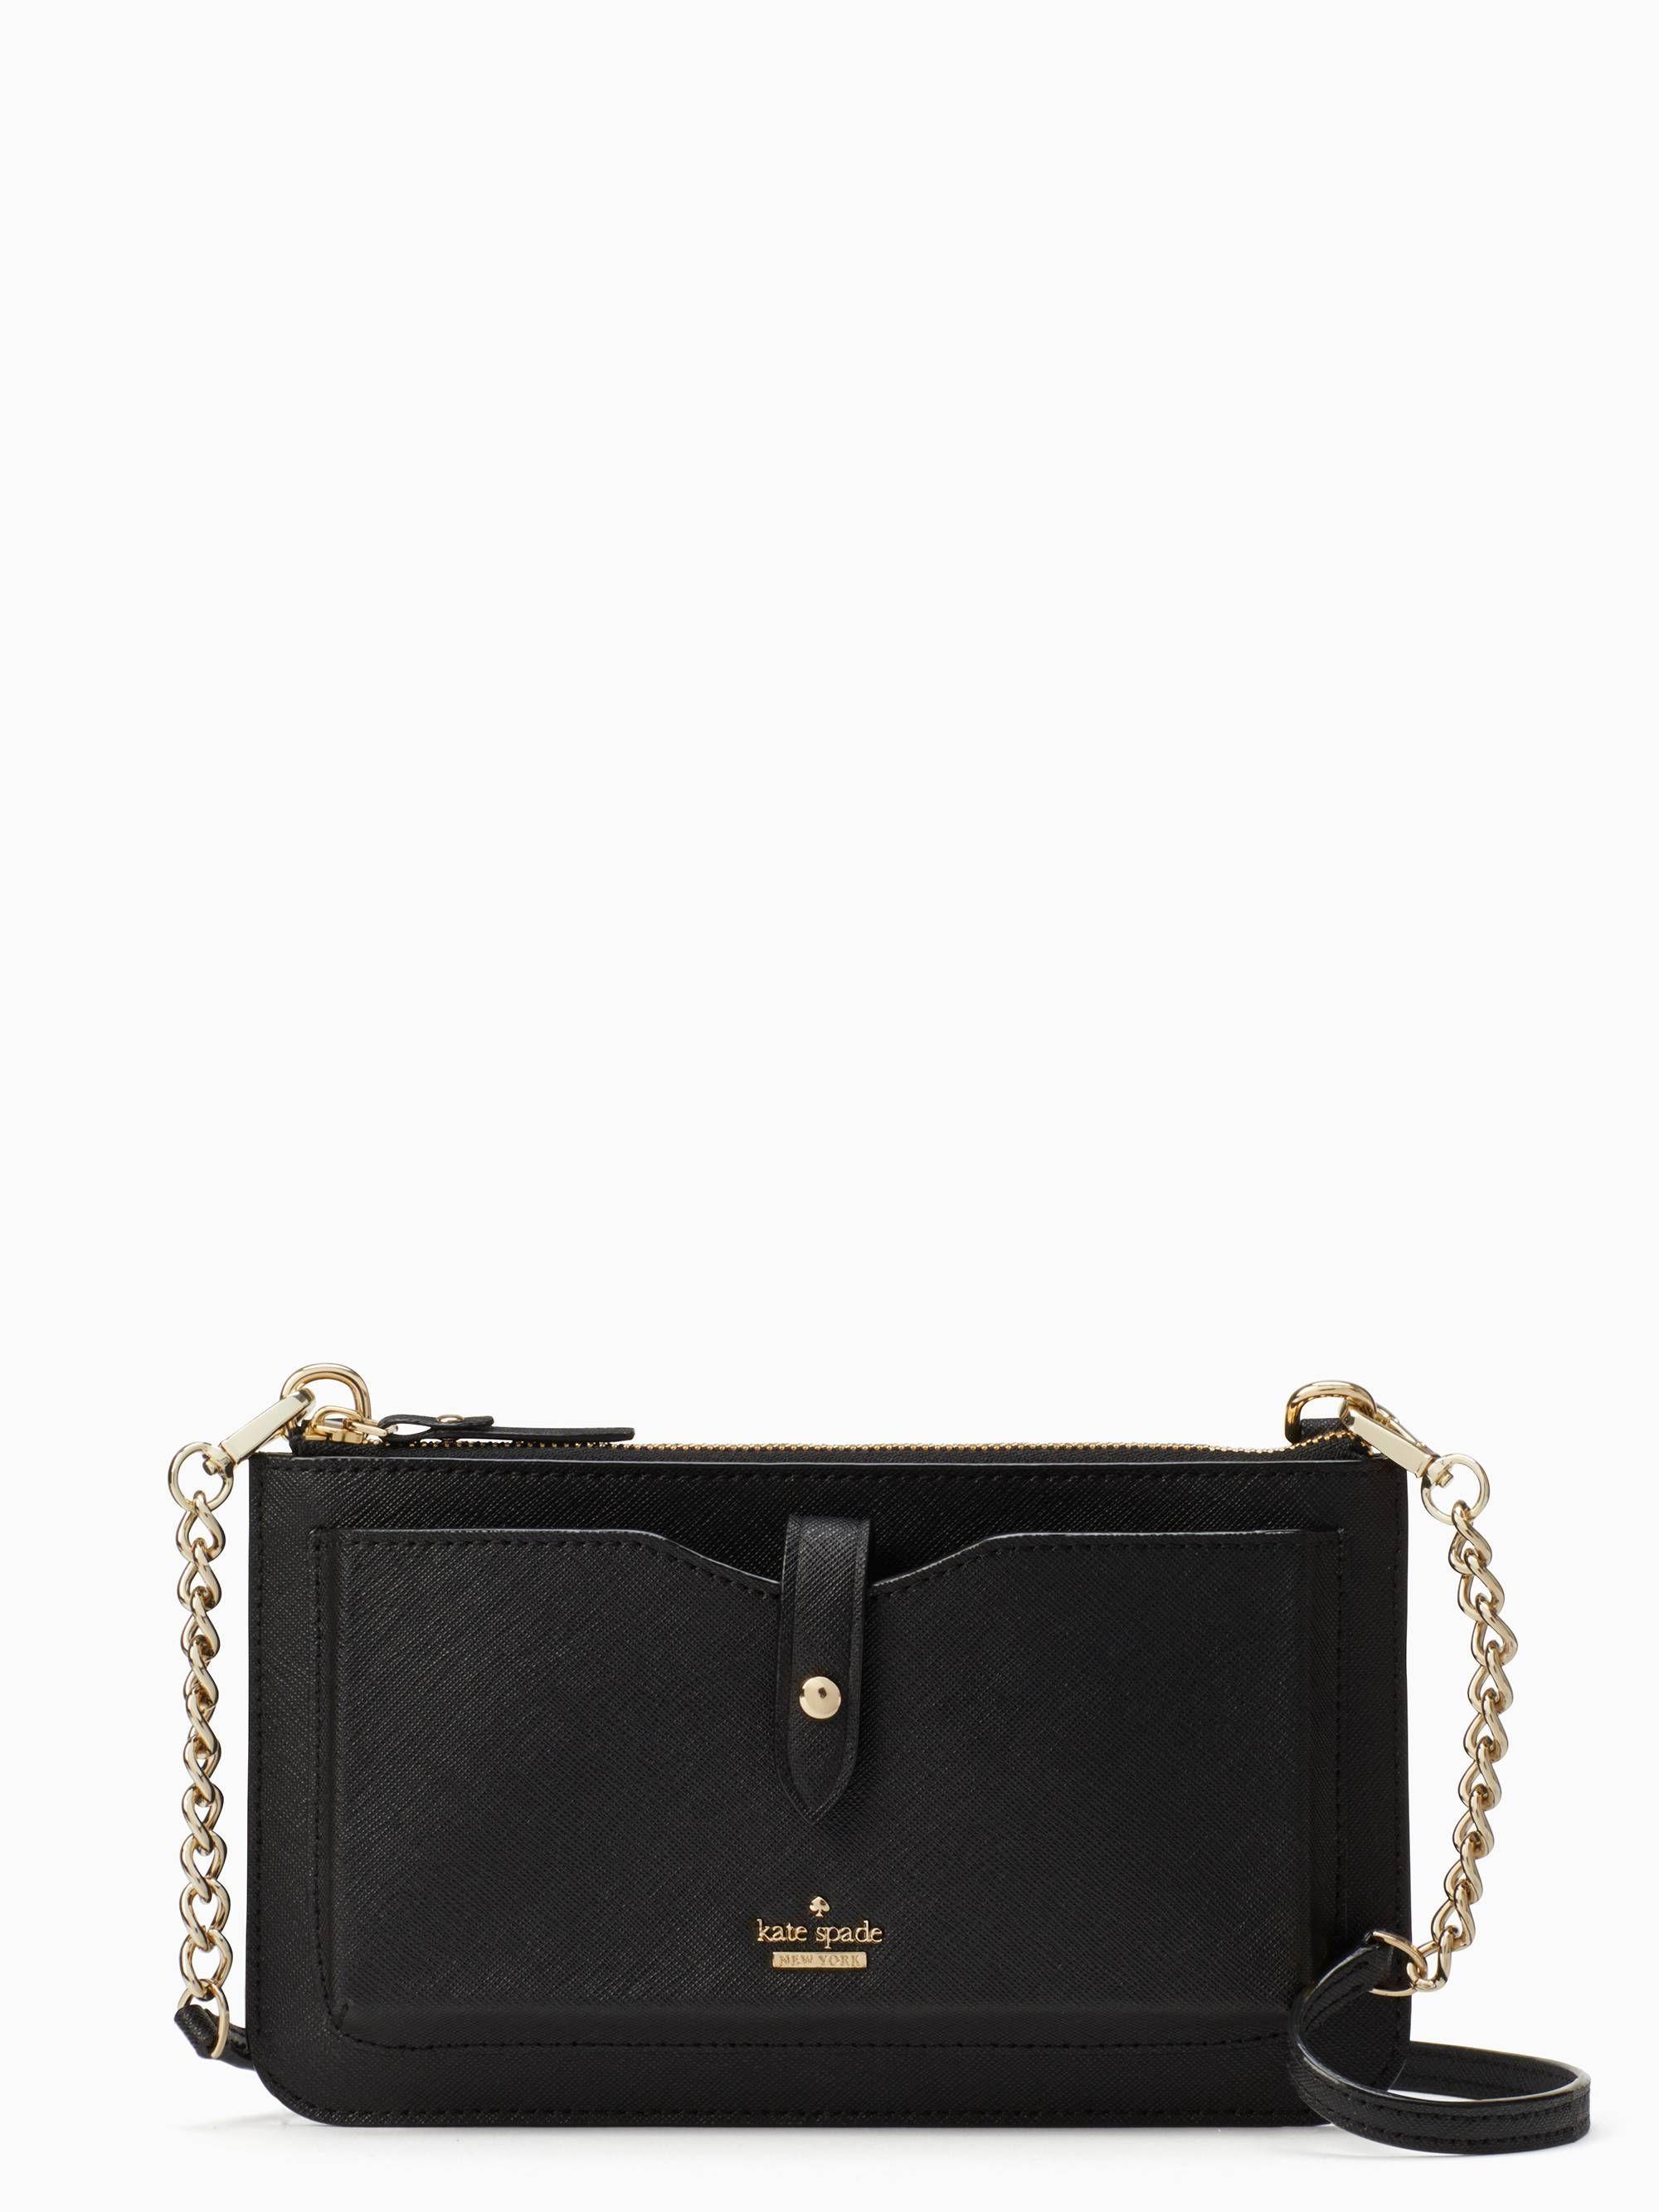 outlet store 0c5f2 8cb08 iphone crossbody bag // black | tenue du jour | Kate spade bag, Kate ...